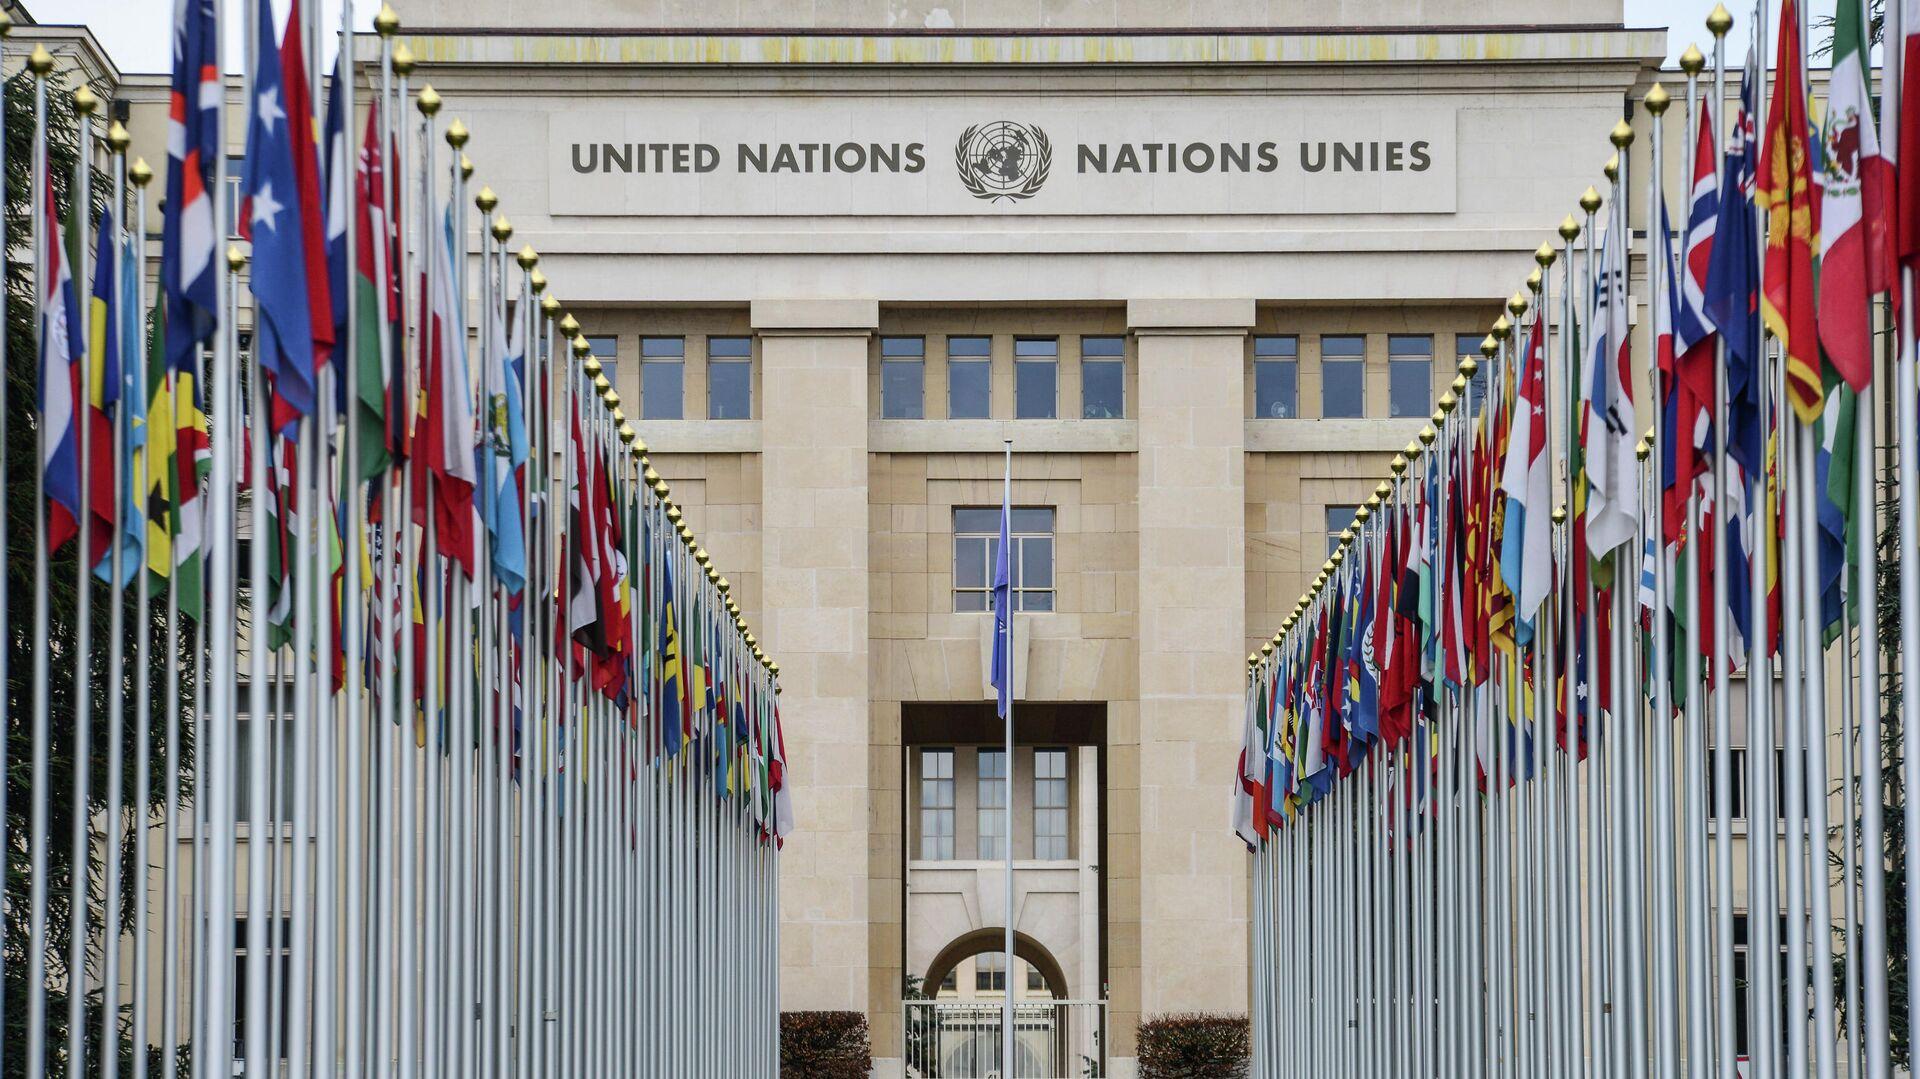 Аллея флагов возле здания ООН в Женеве - РИА Новости, 1920, 18.09.2020